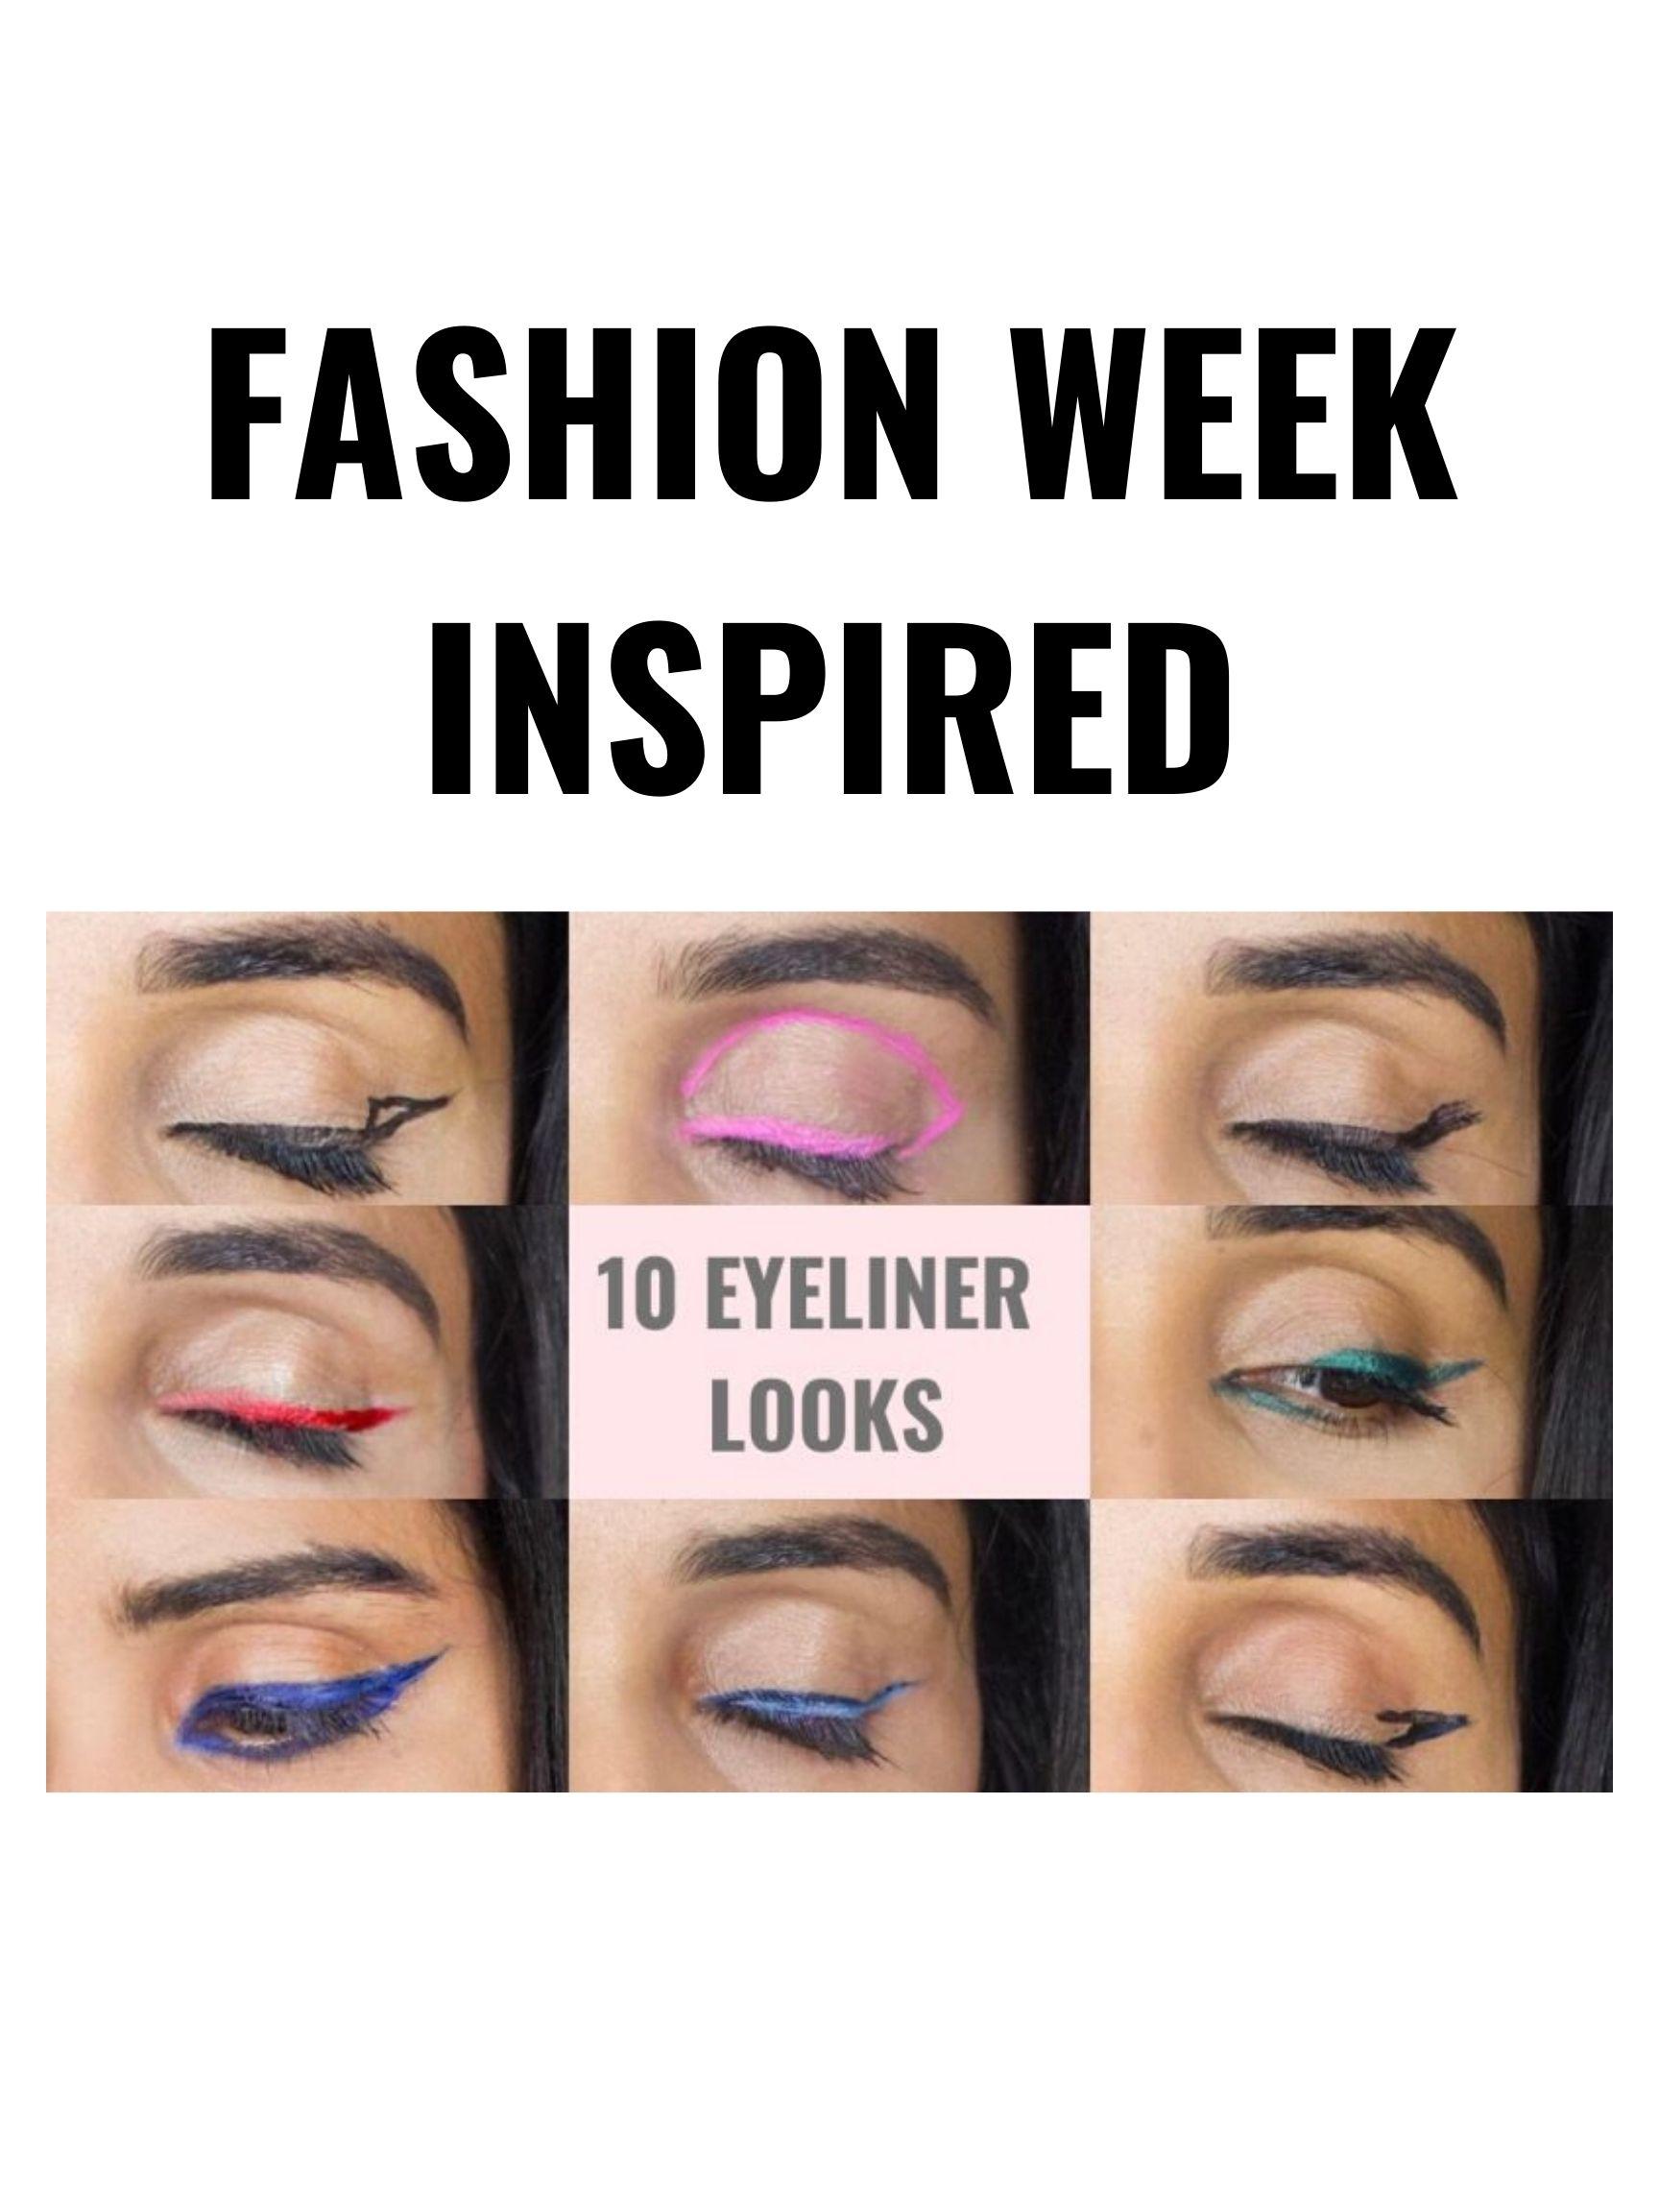 FASHION WEEK INSPIRED 10 EYELINER LOOKS